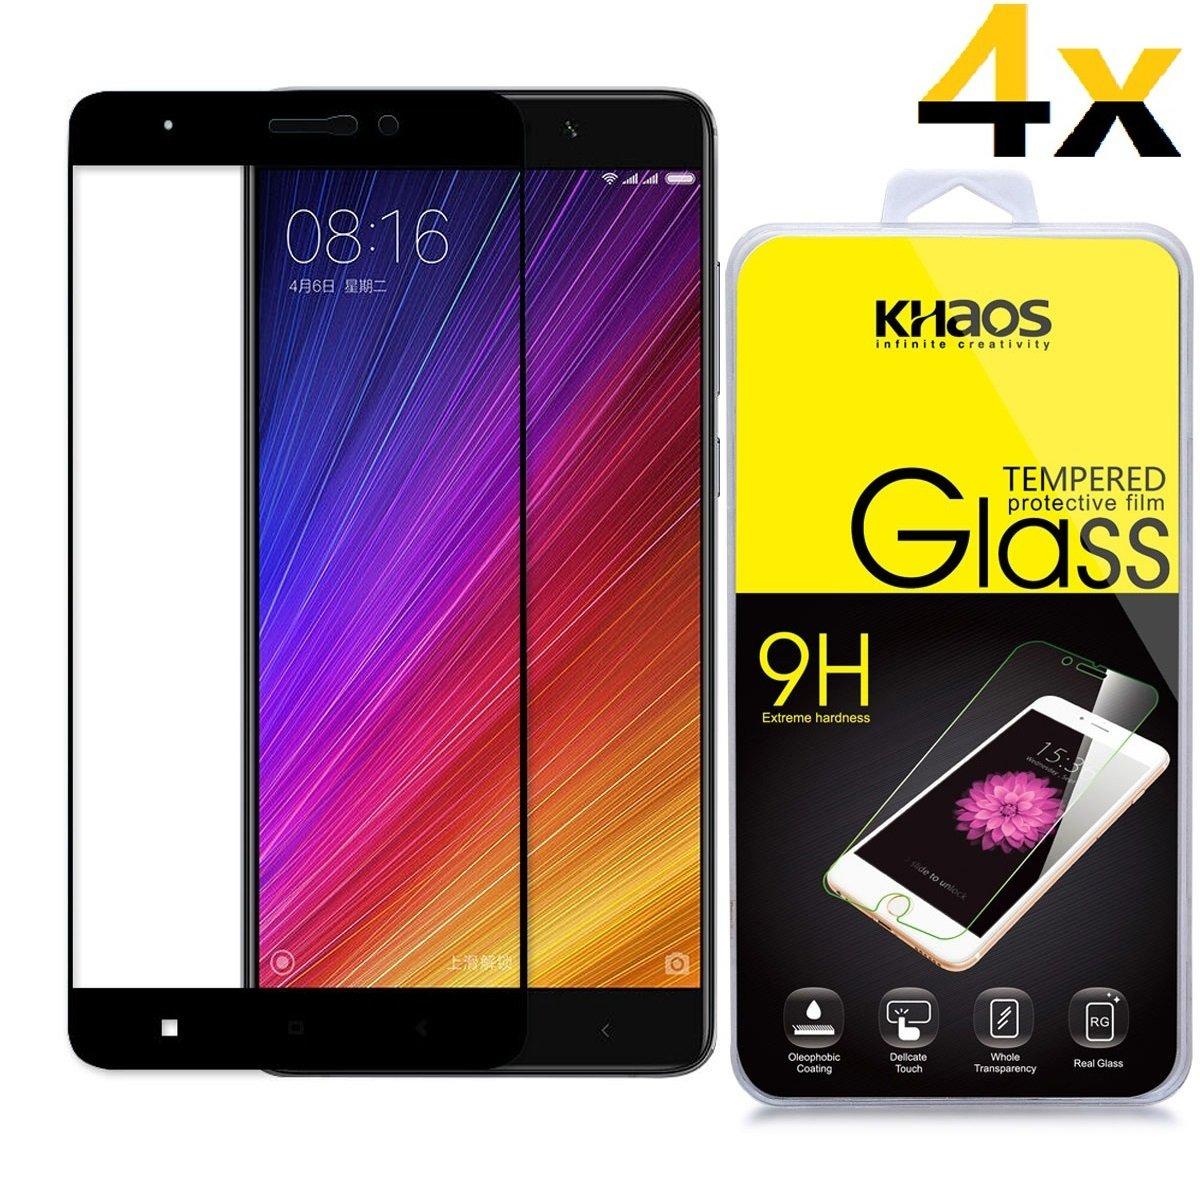 4 Pack Khaos For Xiaomi Mi 5s Plus Tempered Glass Full Screen Cover Mi5s White Protector Black Anti Fingerprint Bubble Freelifetime Replacement